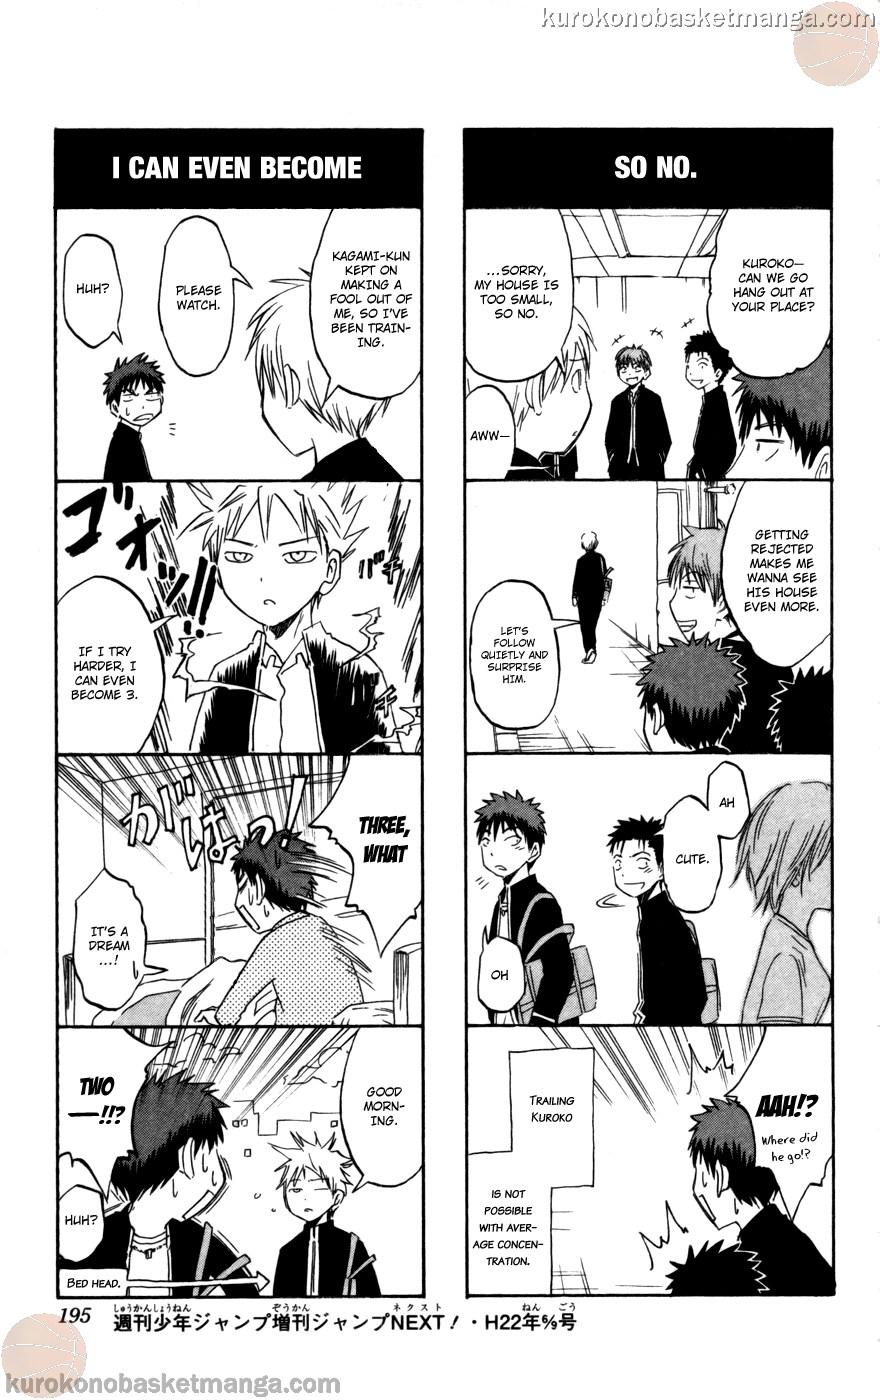 Kuroko no Basket Manga Chapter 108 - Image 24